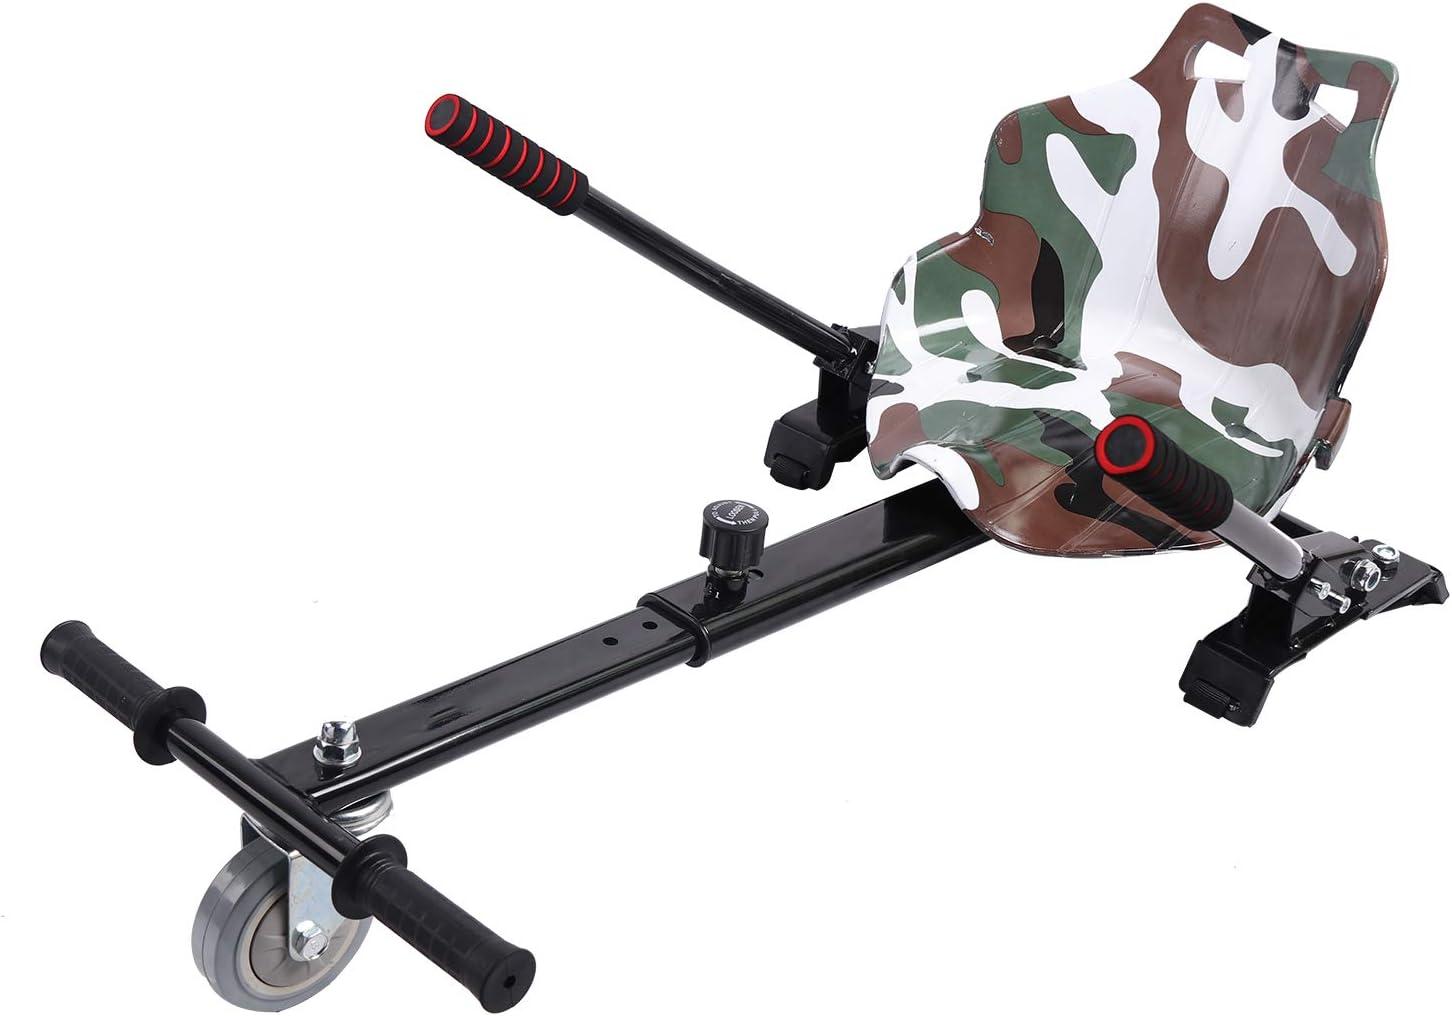 COLORWAY Sitz f/ür Hover Scooter Board Sitzscooter Hoverkart Go-Kart Sitz f/ür Elektro Scooter Self Balancing Scooter Kompatibel mit Allen 6,5 8.5zoll und 10 Zoll Scooter